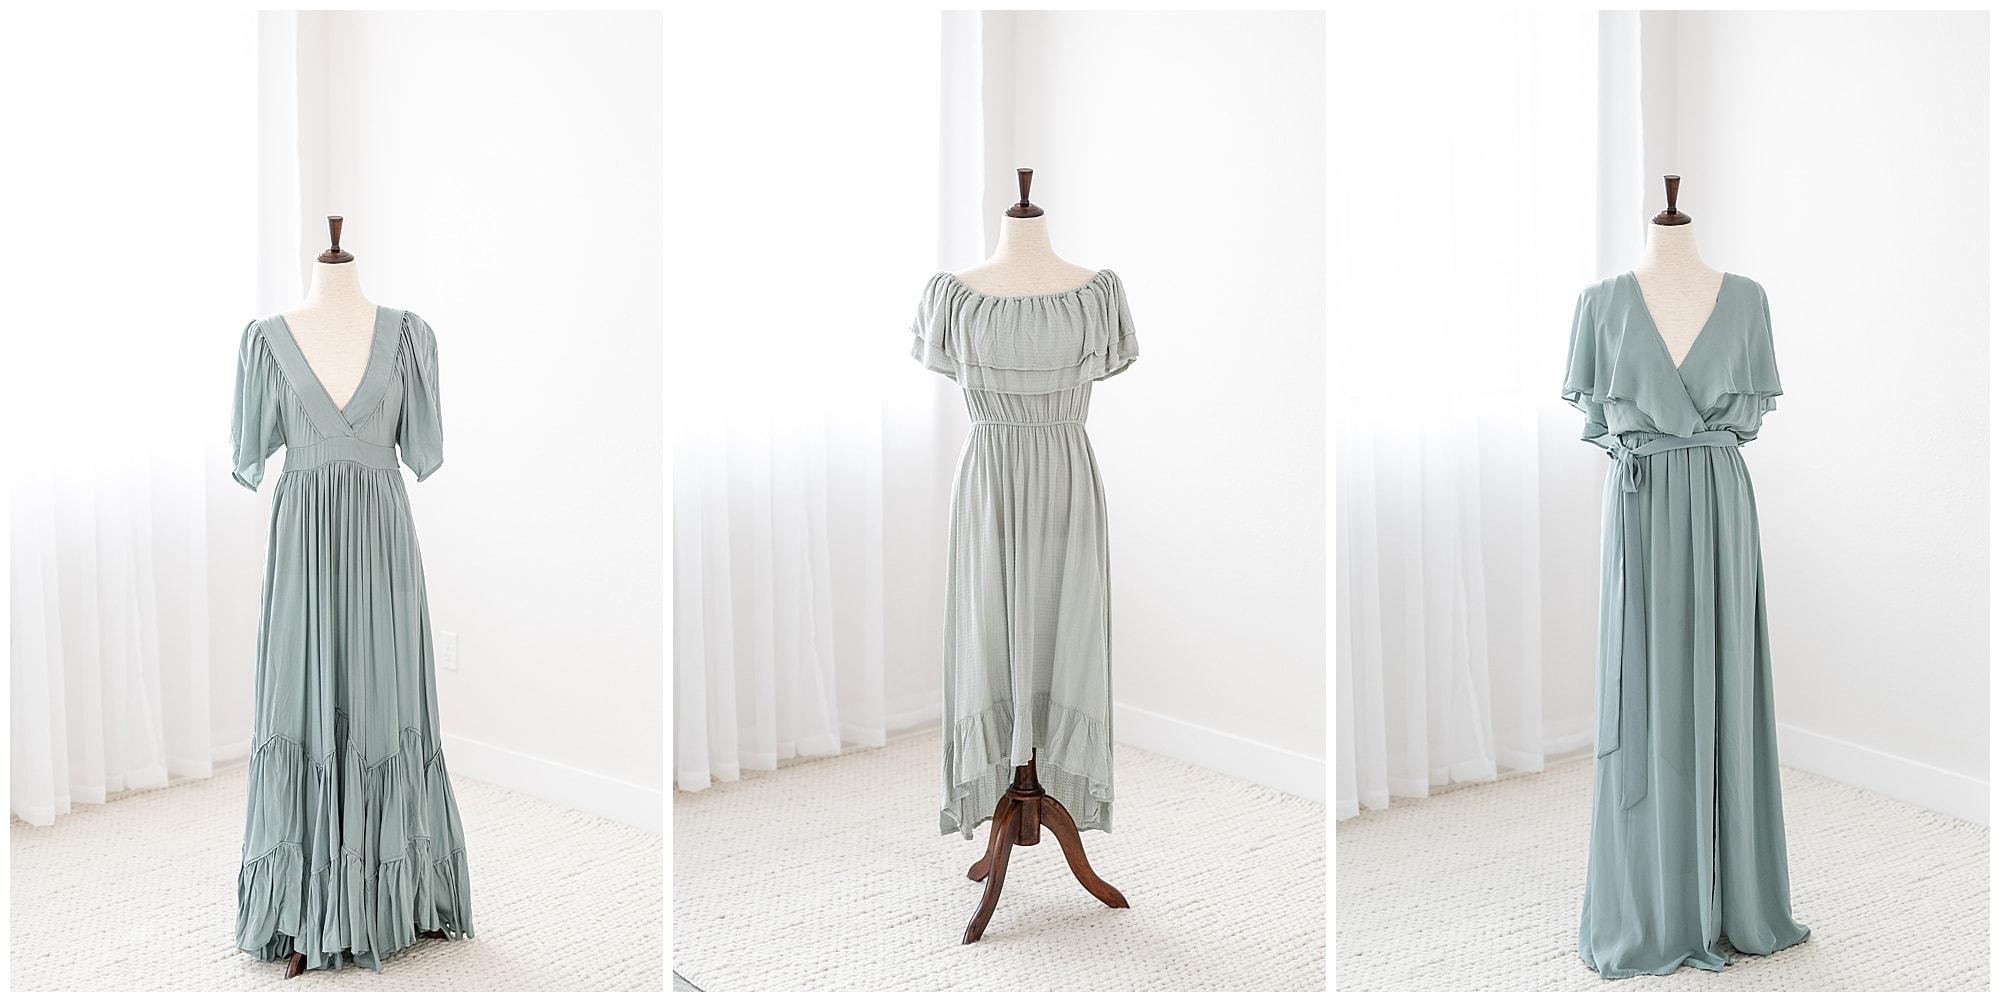 McKinney Photographer Studio Wardrobe Options